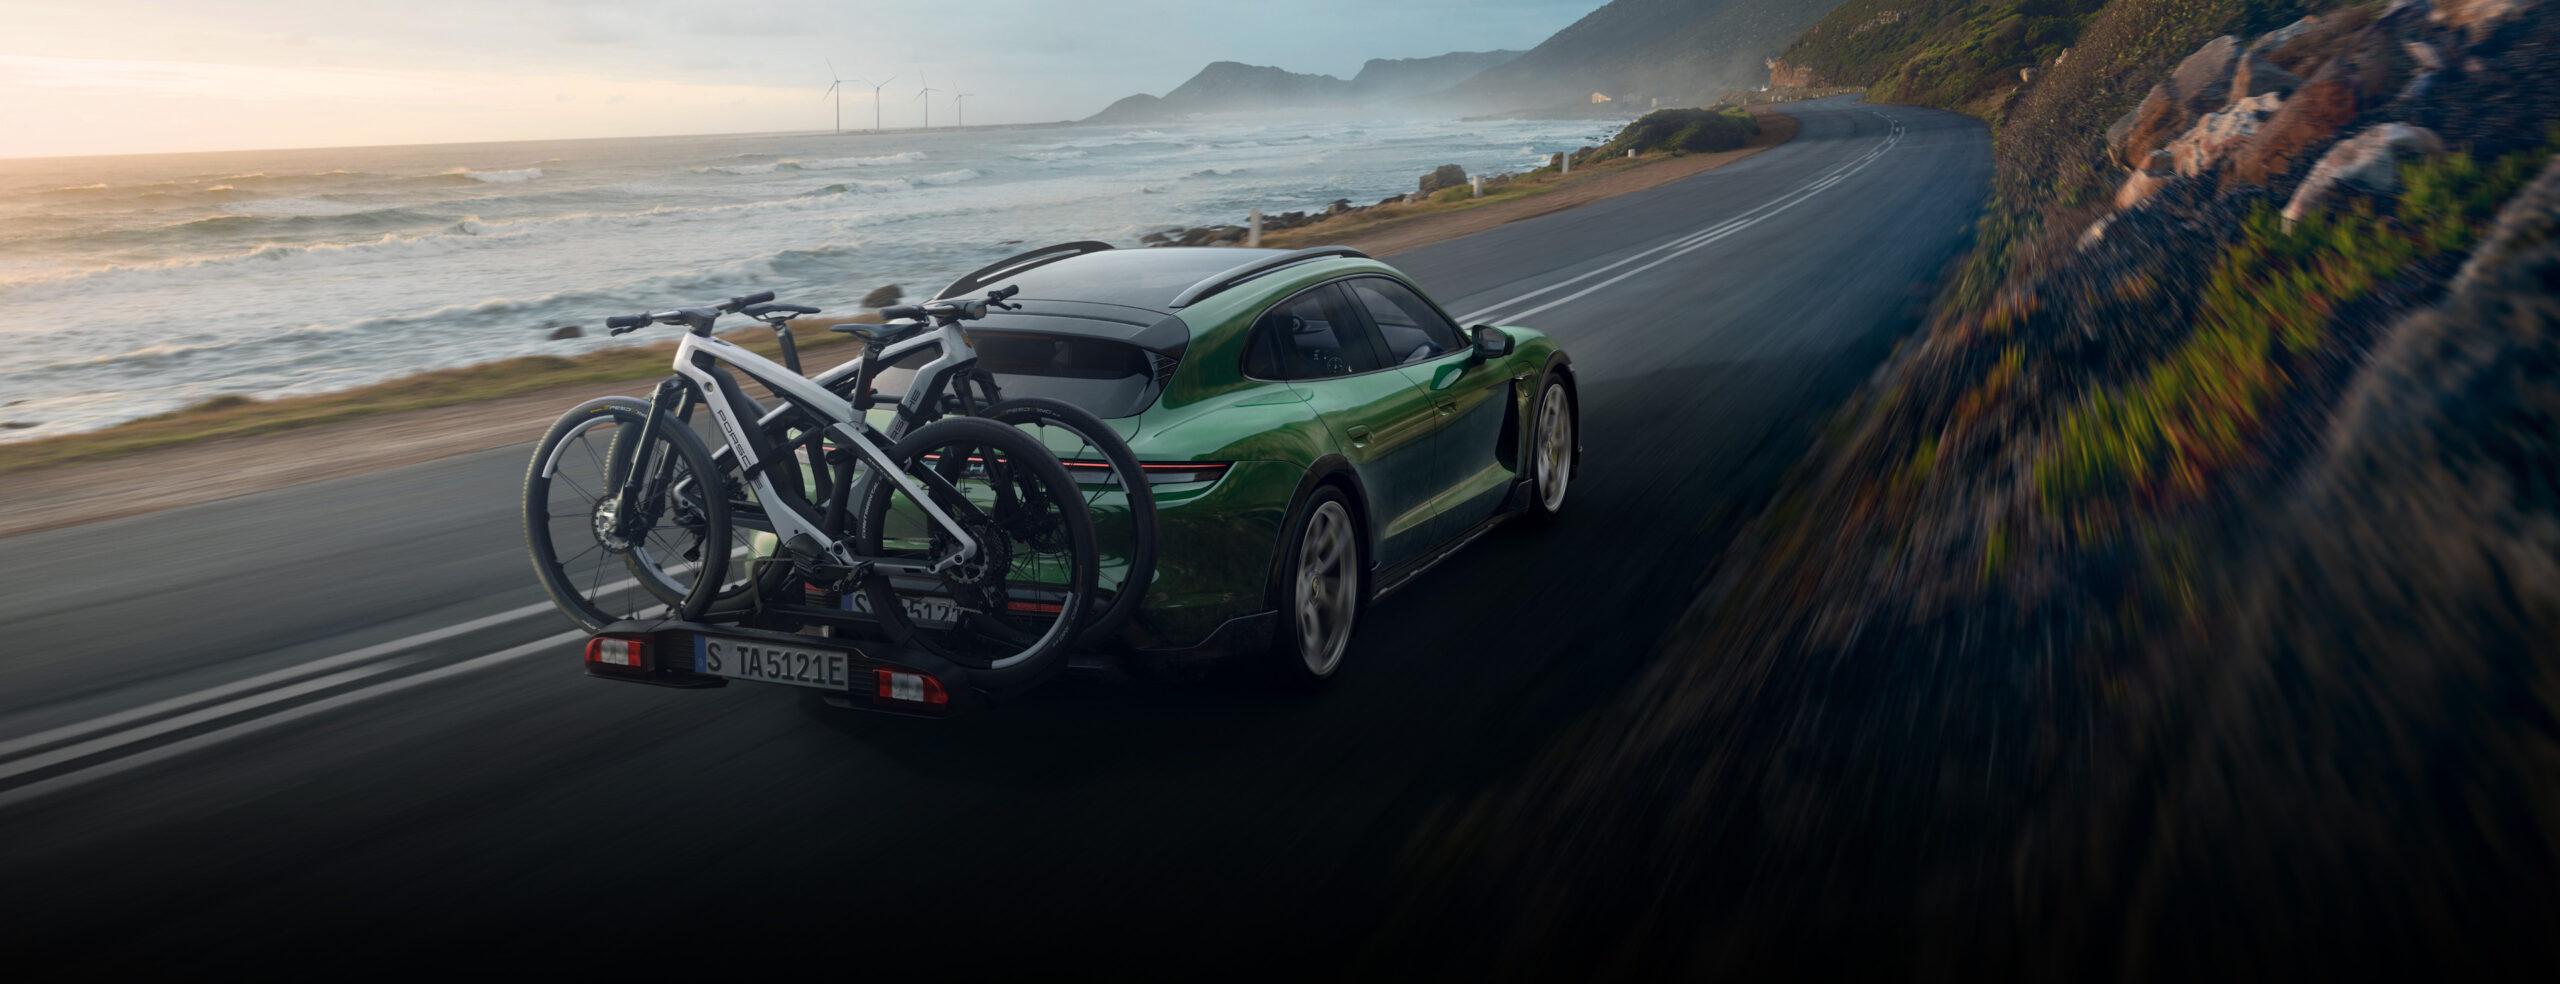 Porsche Ebike